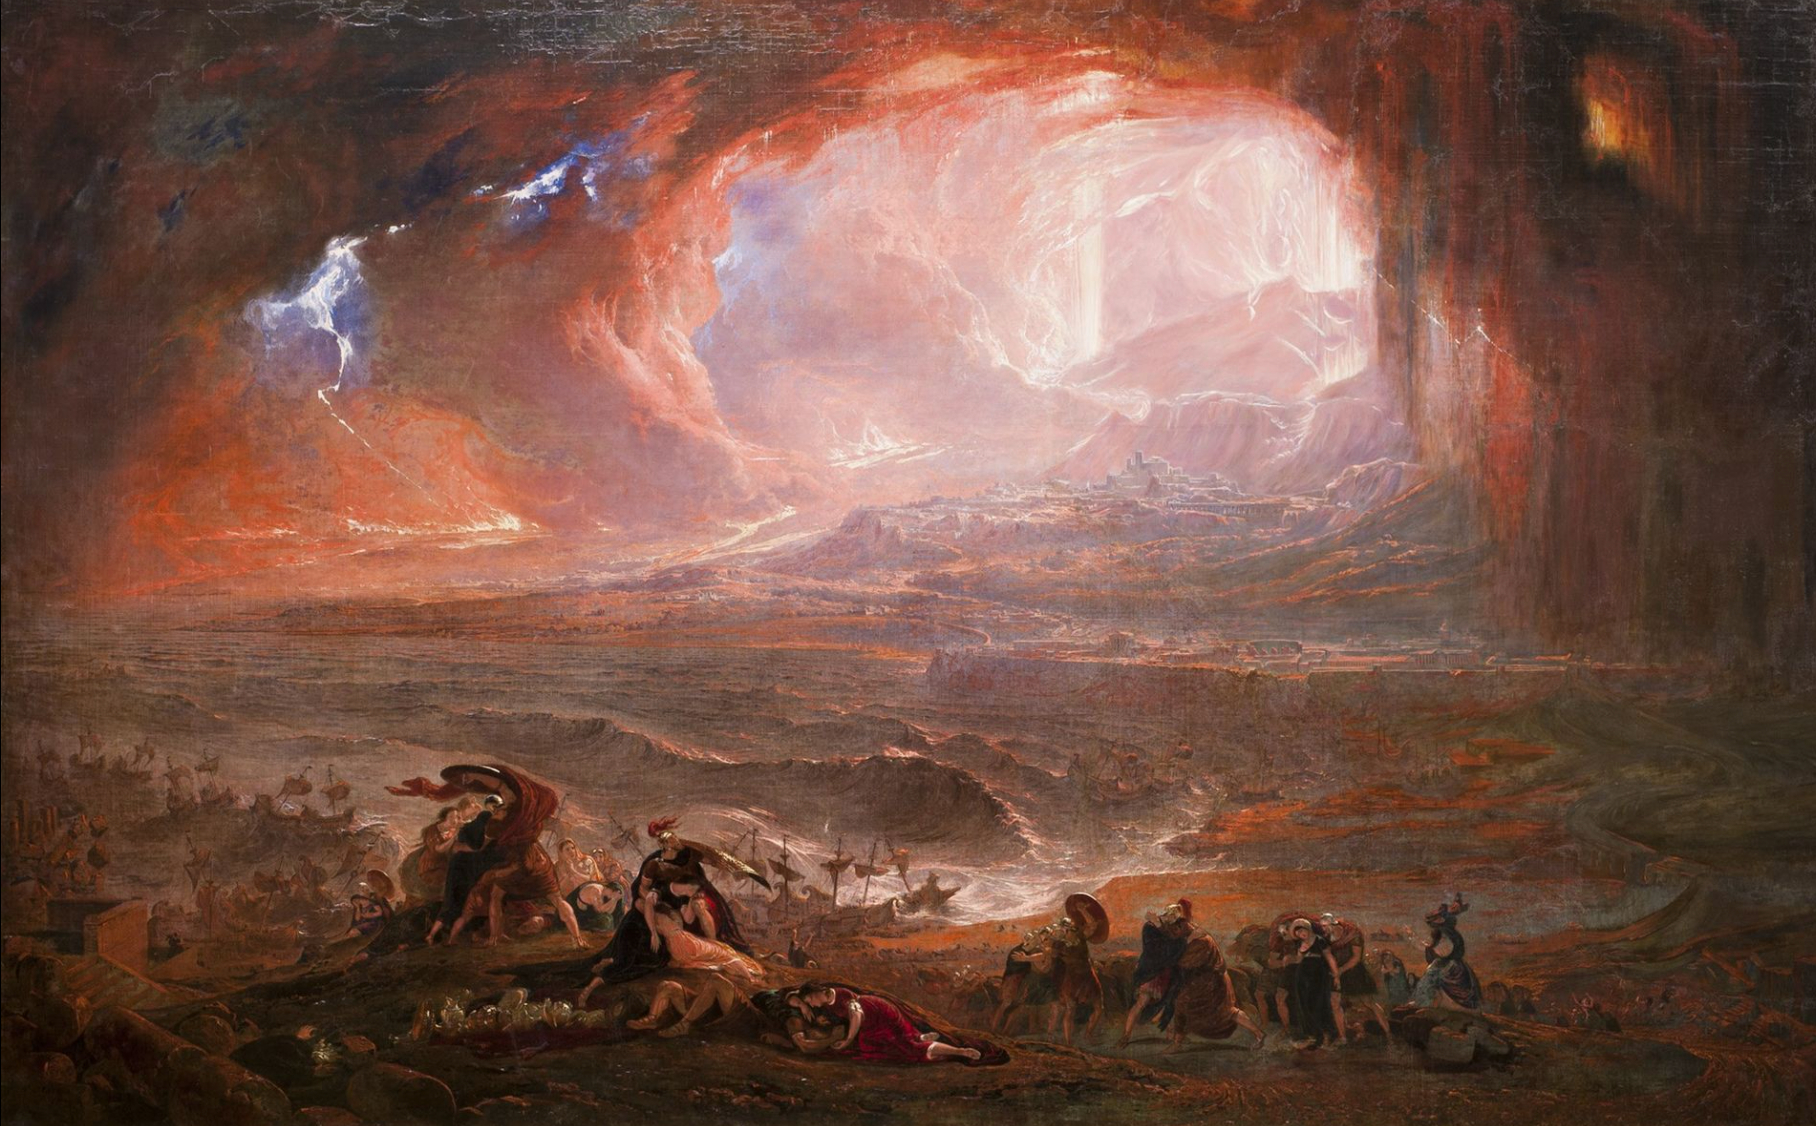 The restored version of John Martin's Destruction of Pompeii and Herculaneum